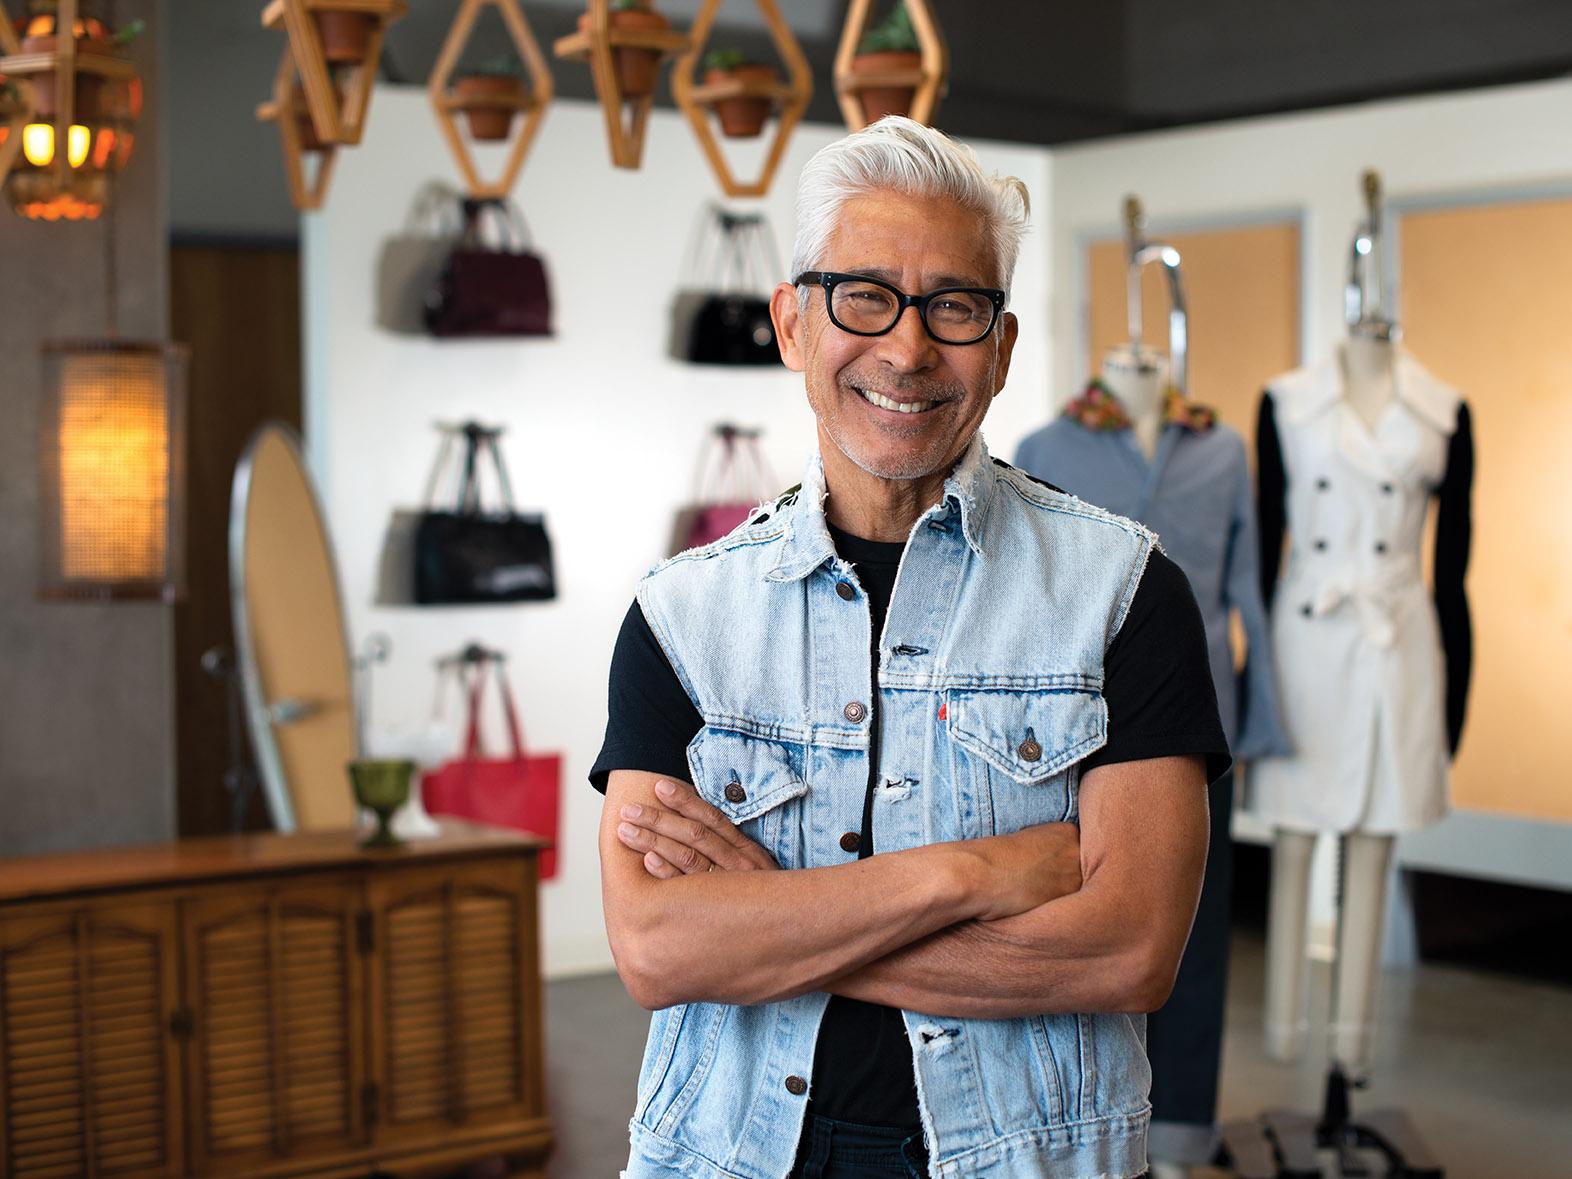 Designer Jeff 'Yoki' Yokoyama and Goodwill of O.C. Create A Sustainable Line